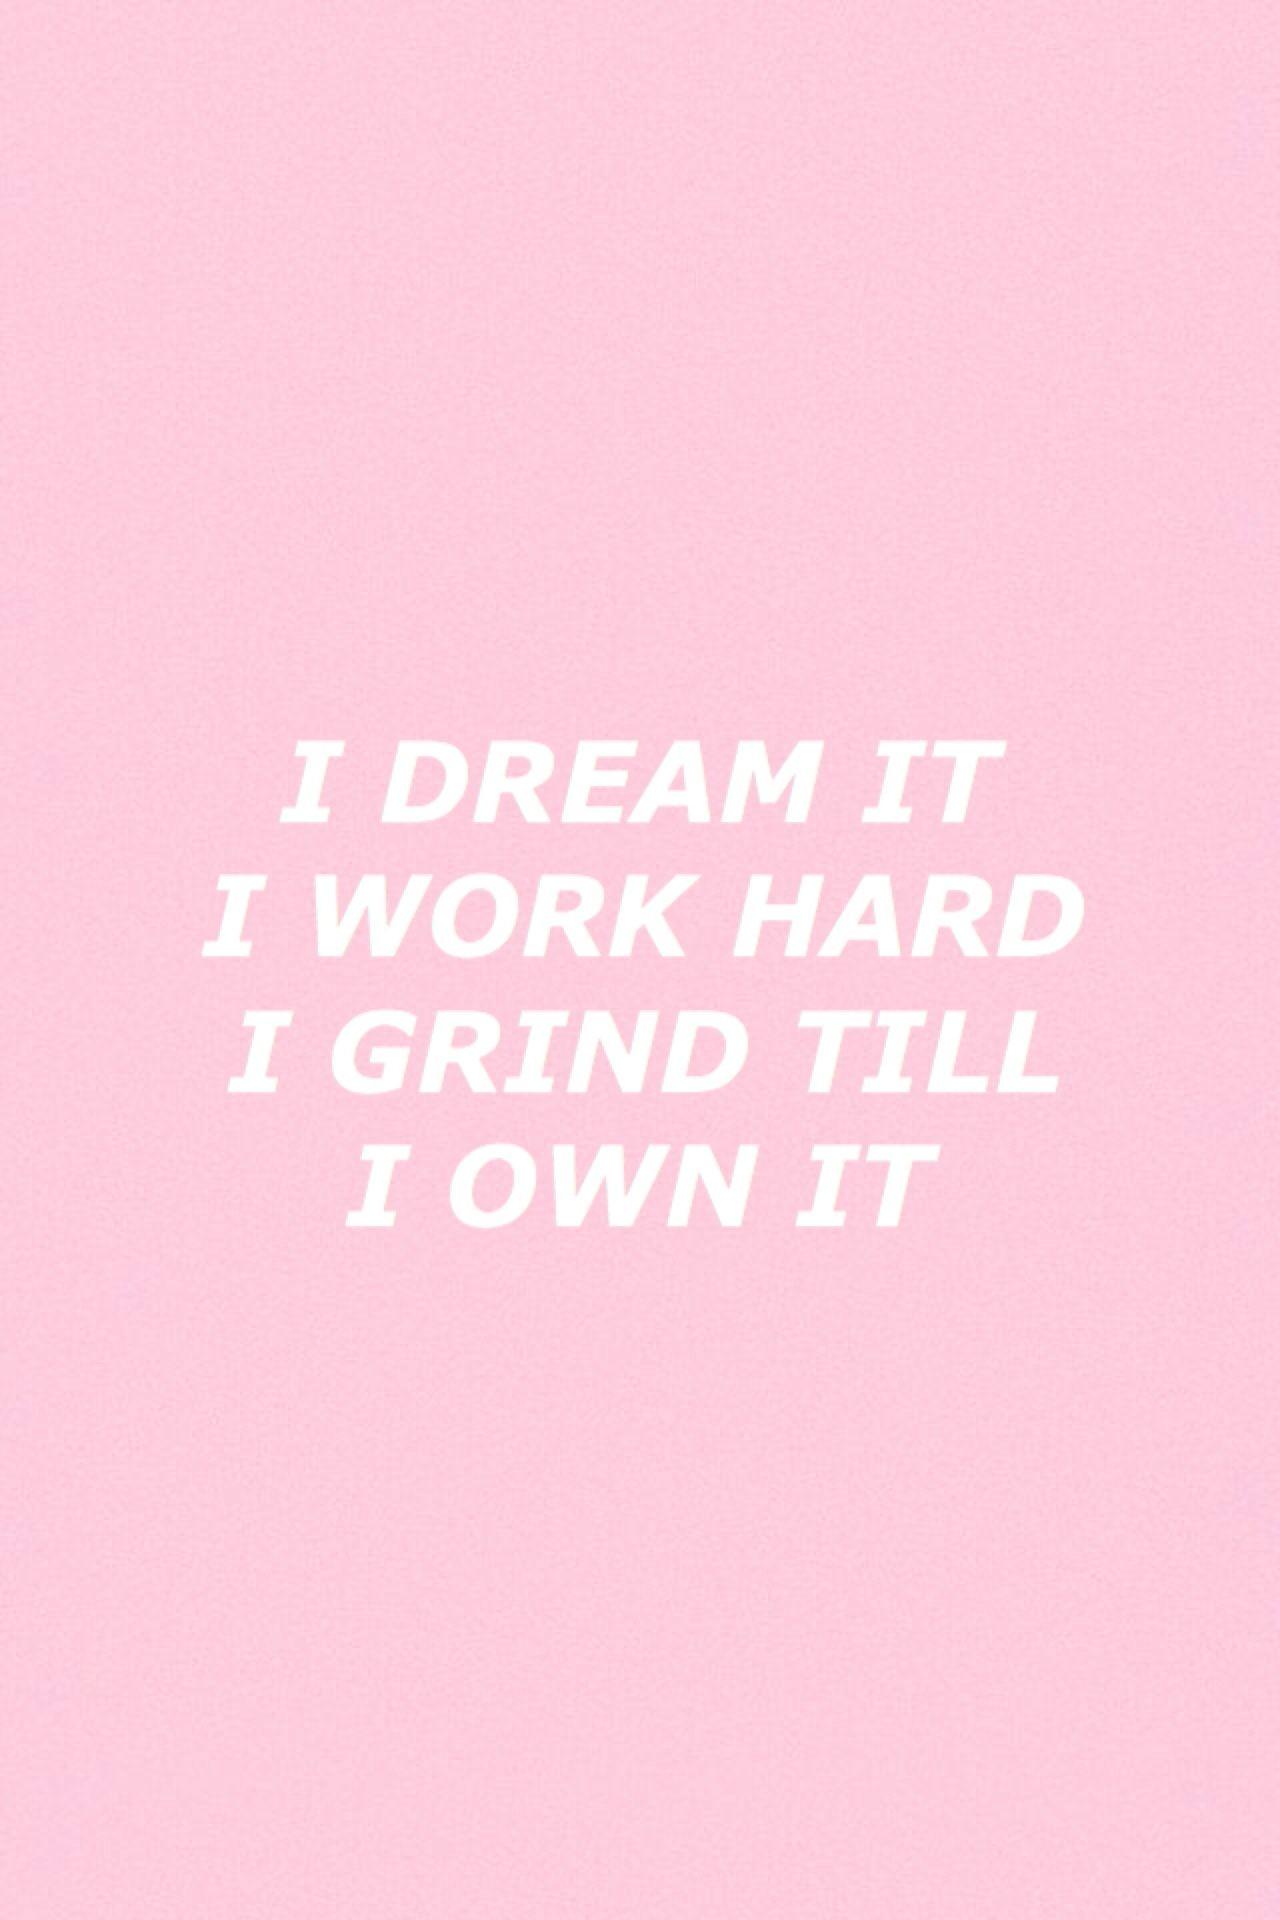 Iphone wallpaper tumblr queen - Inspirational Wallpaper Tumblr